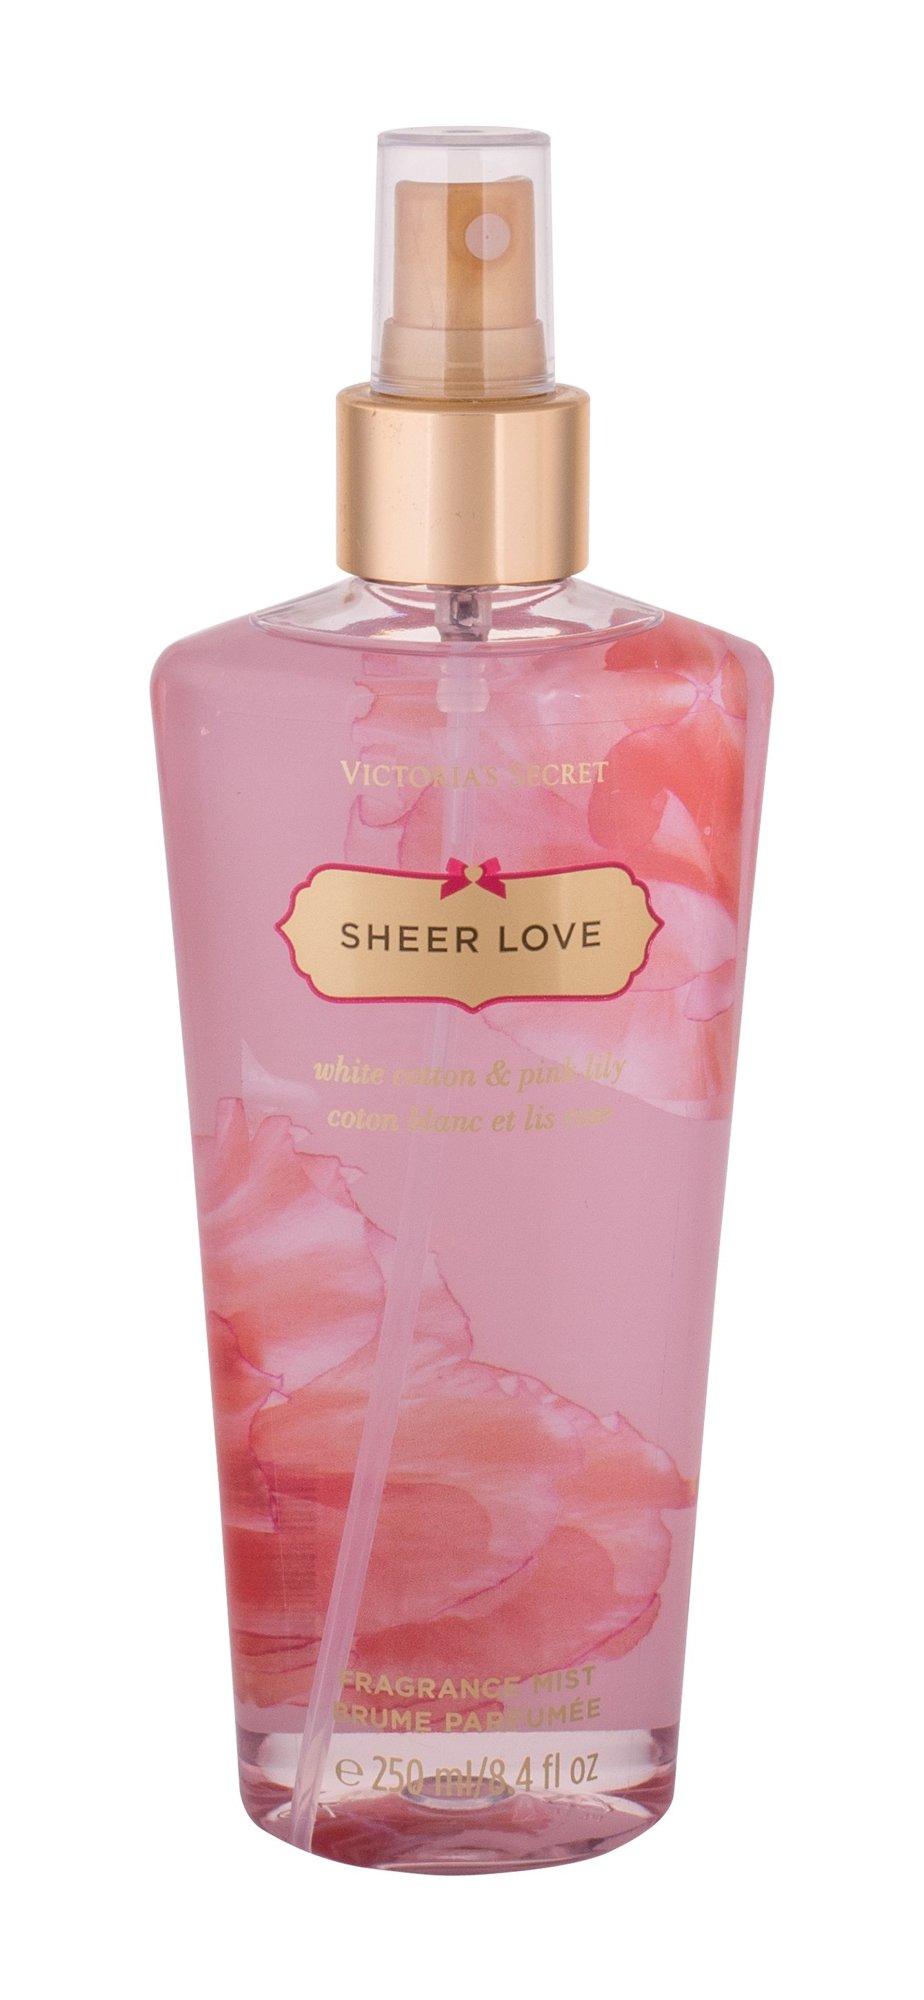 Victoria´s Secret Sheer Love Nourishing body spray 250ml